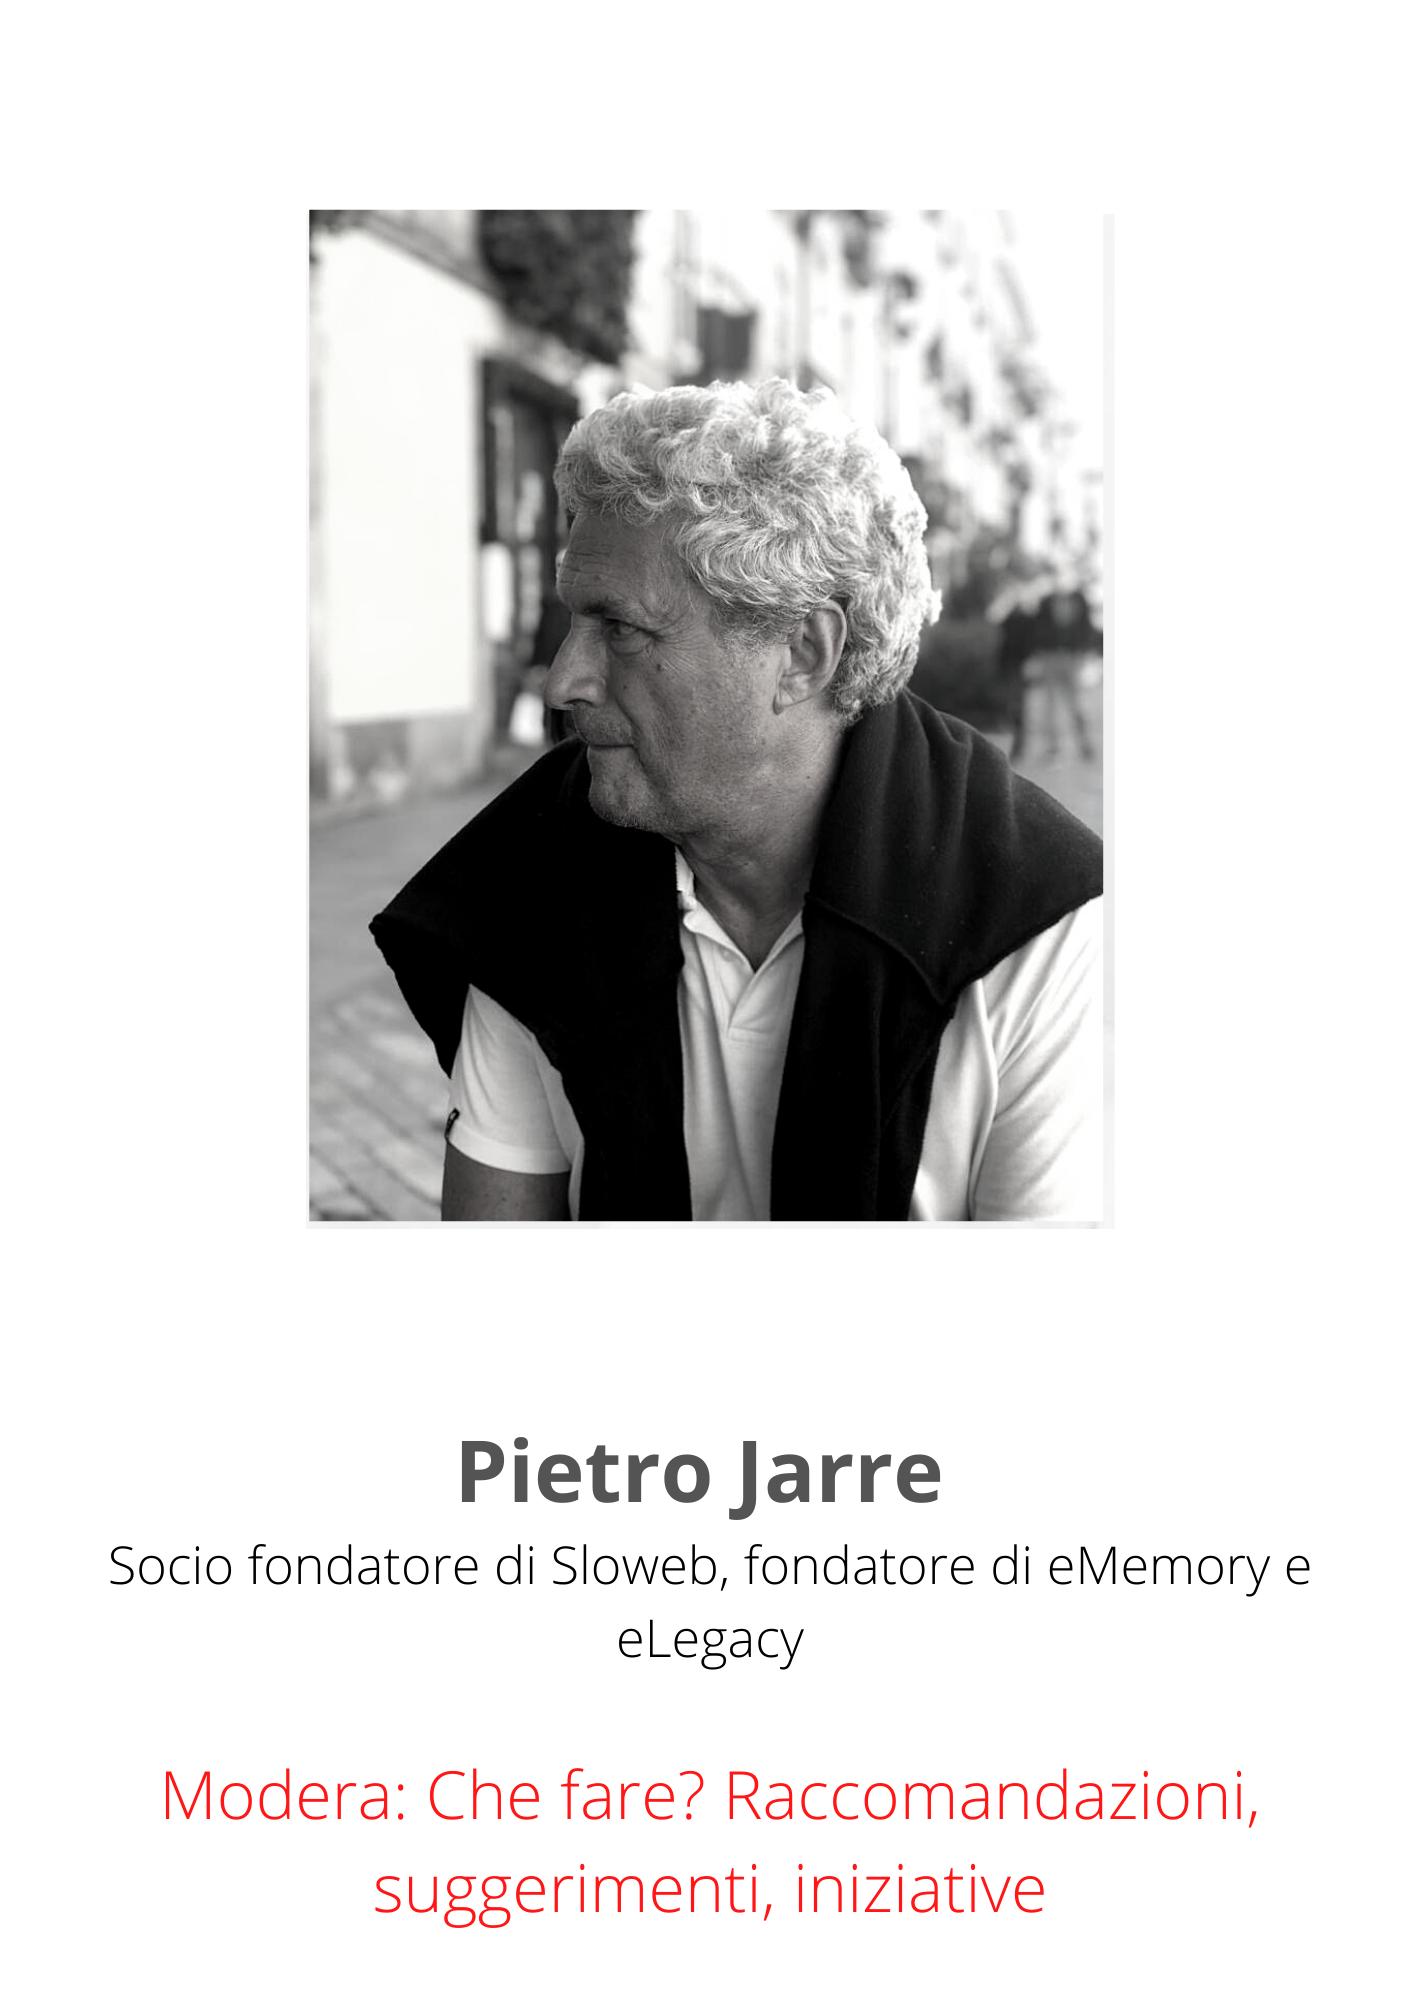 Pietro Jarre